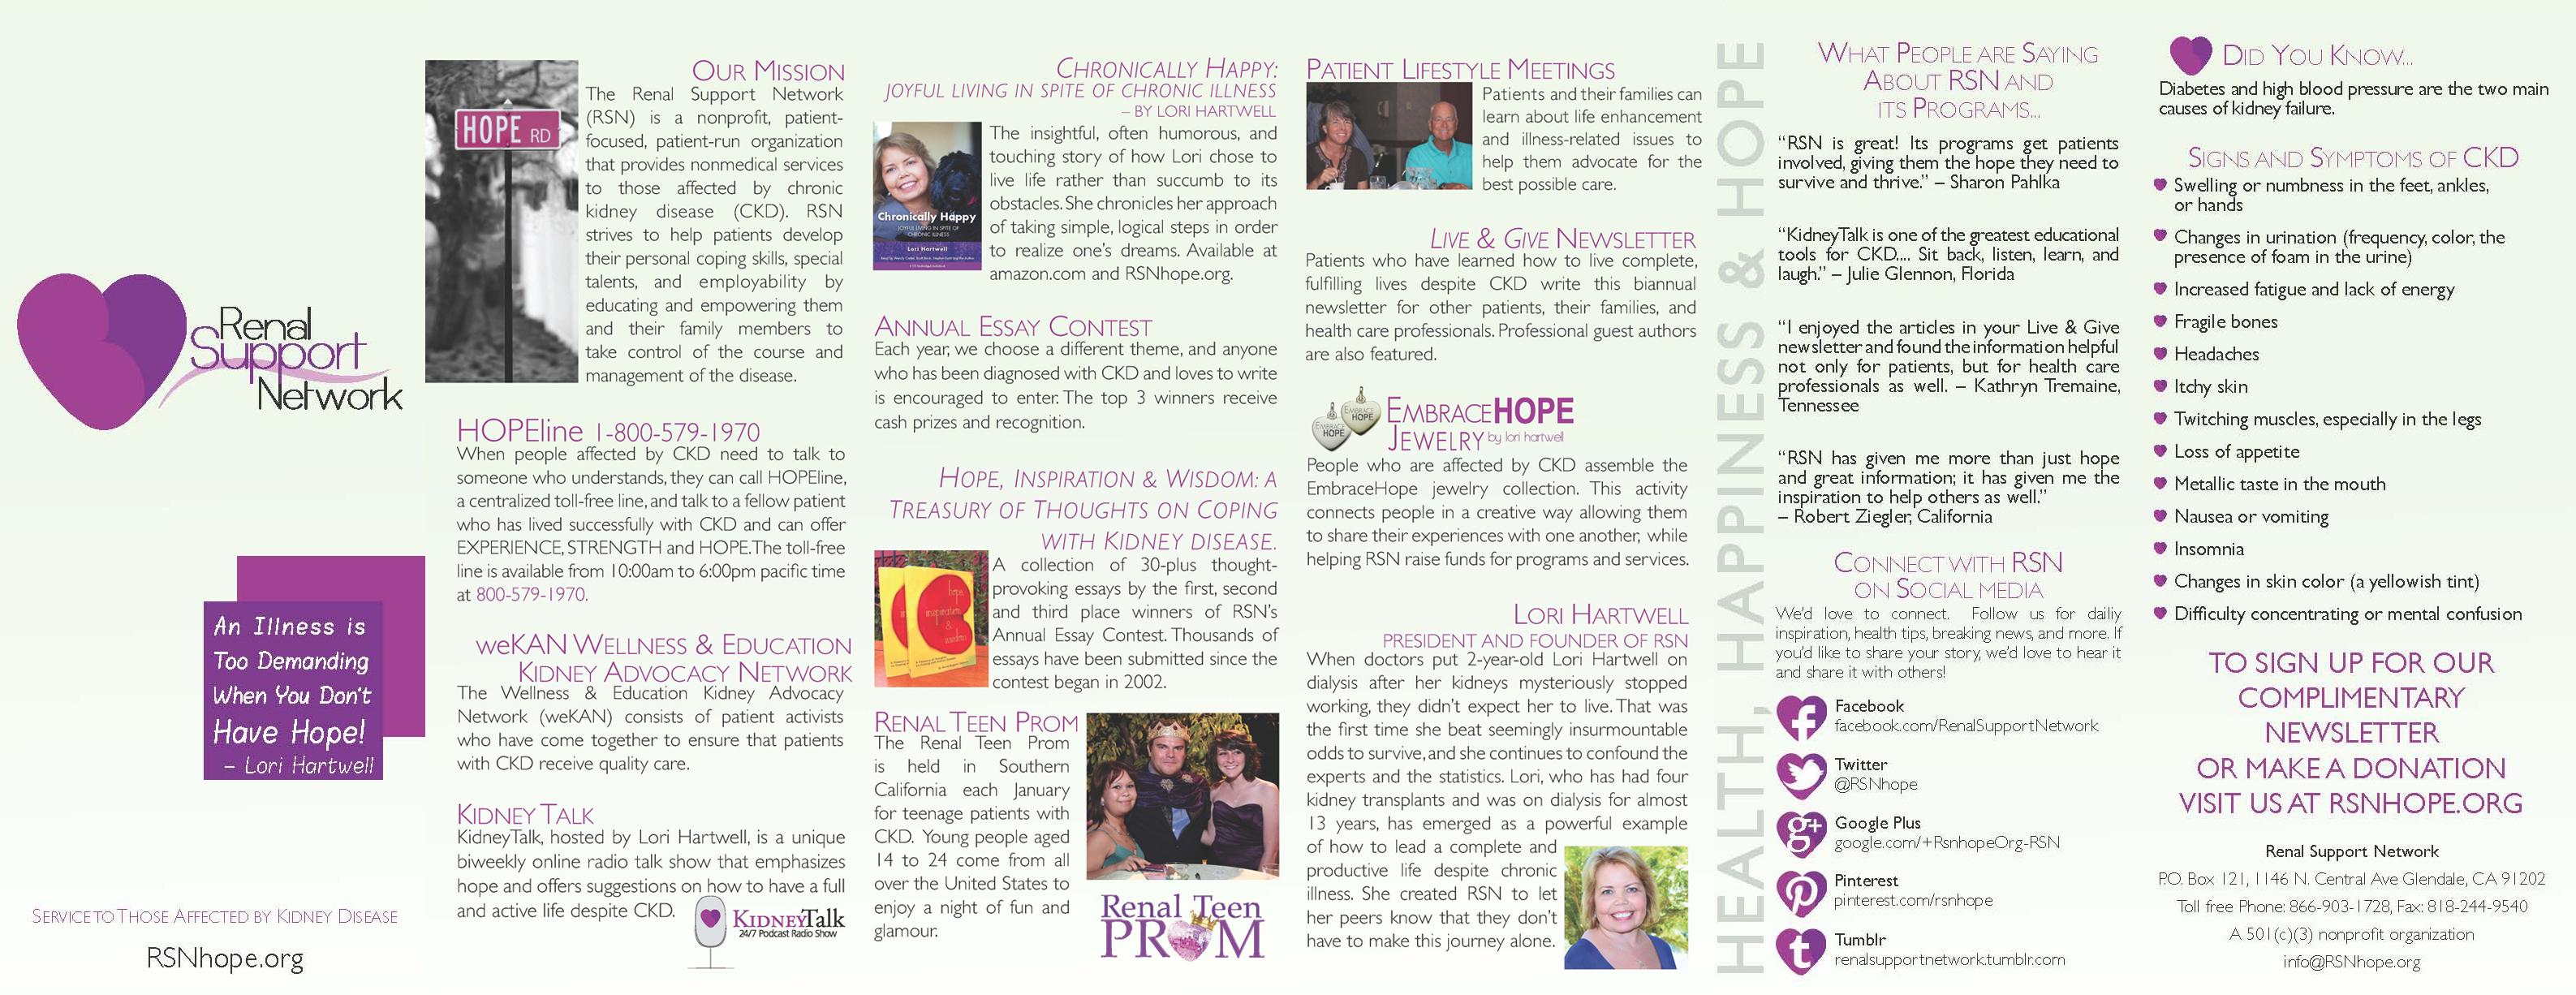 Renal support Network Programs Brochure